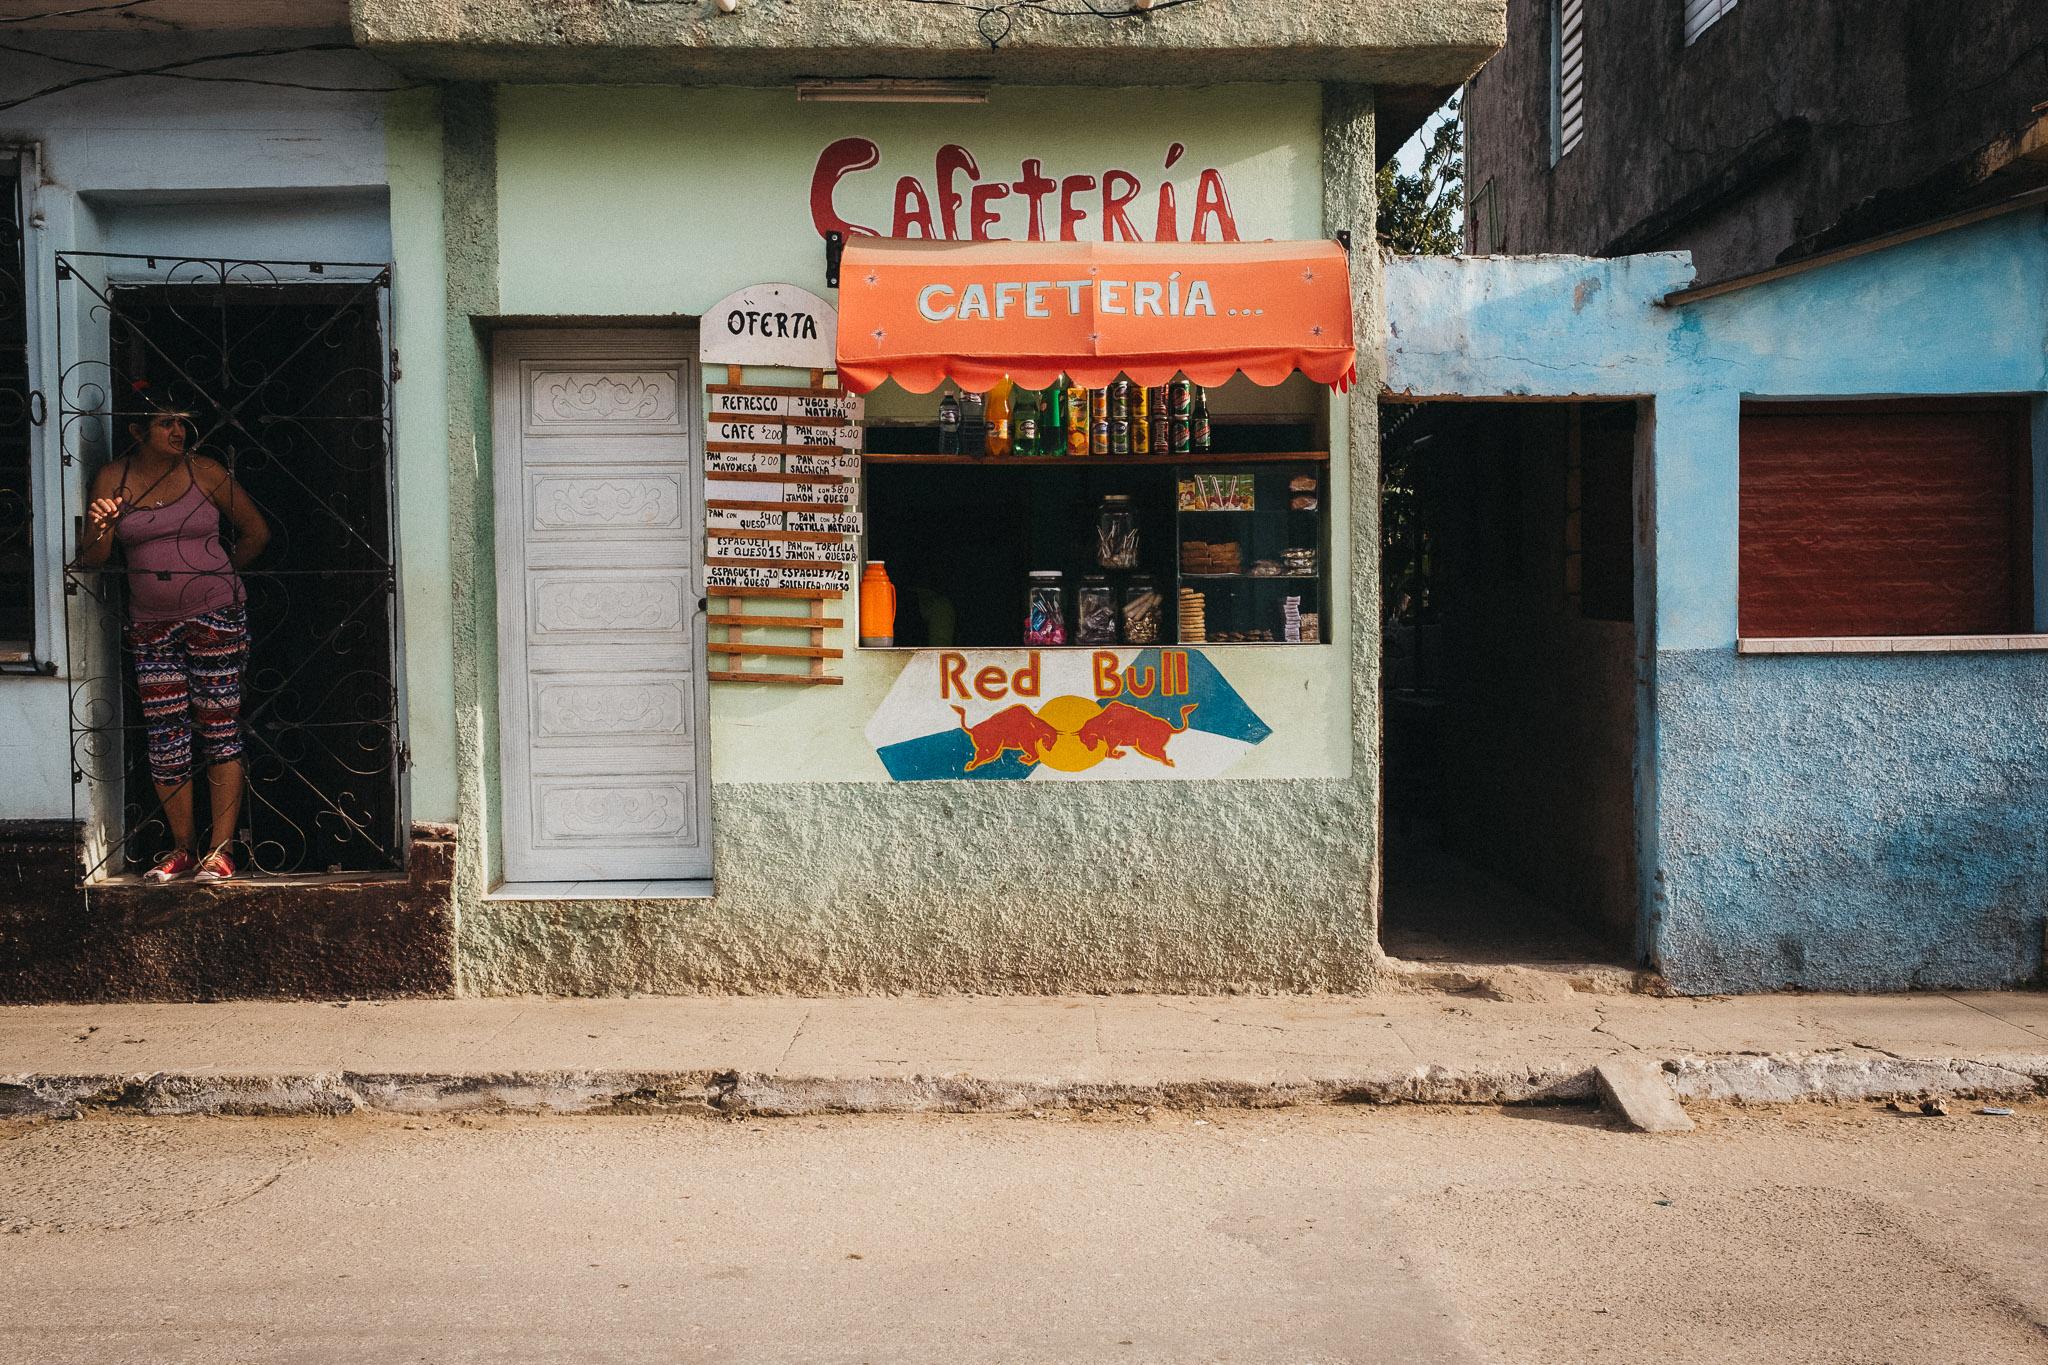 Cuba-2017-12-Trinidad-0187.jpg